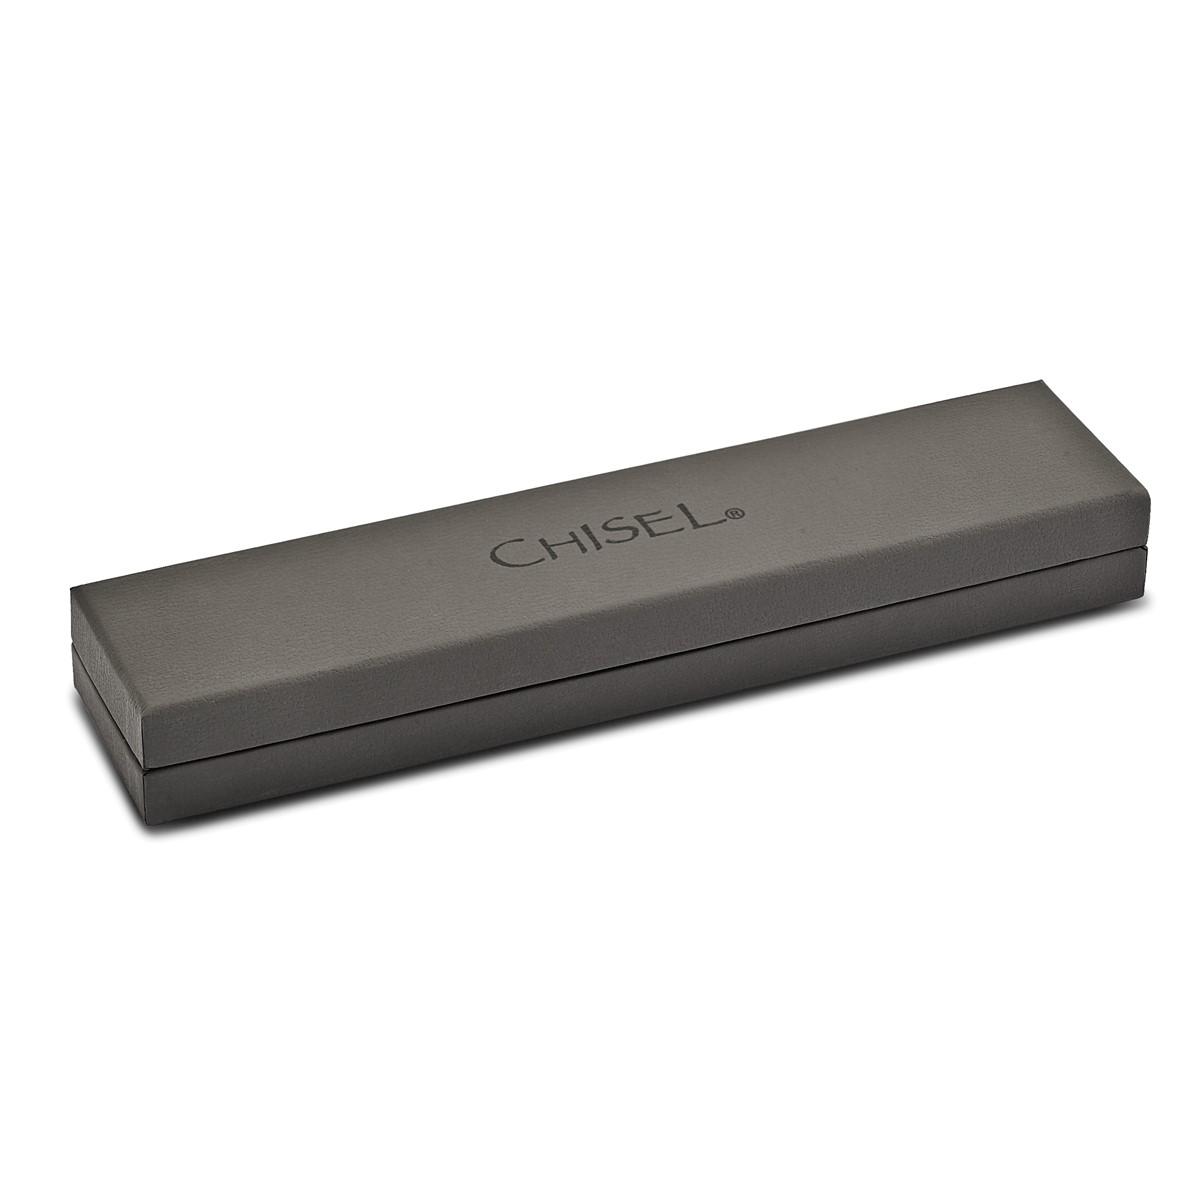 Stainless-Steel-Carbon-Fiber-Cross-Curb-Chain-Bracelet-8-5in-long